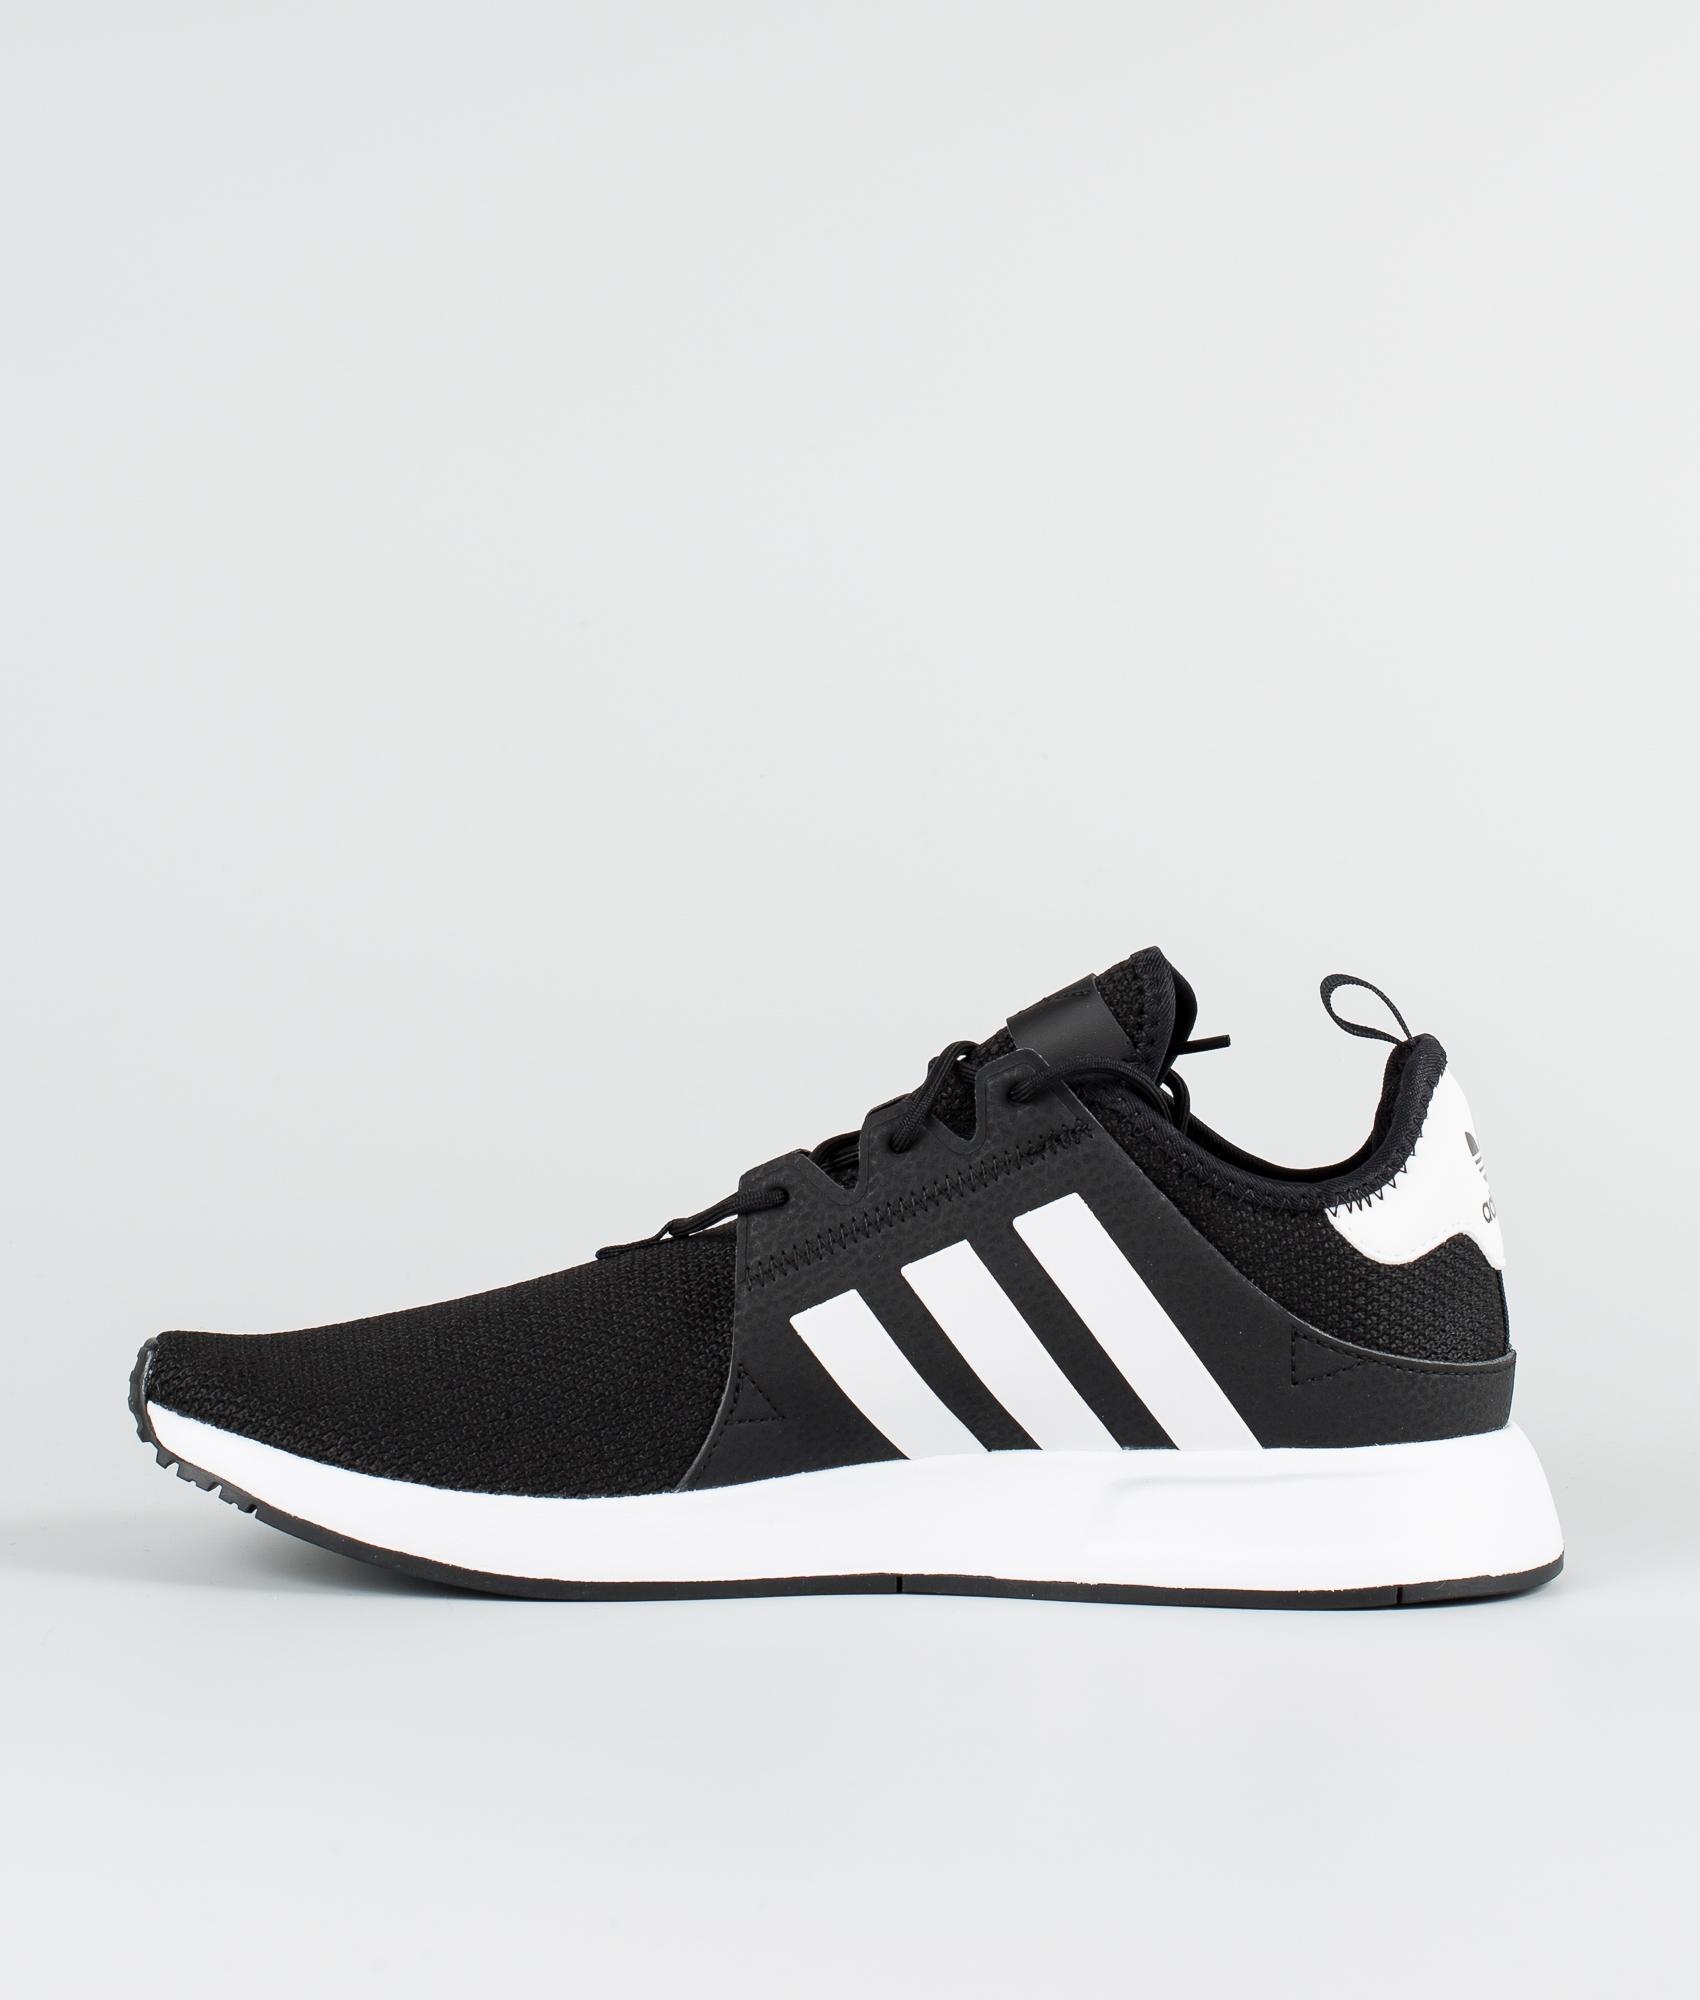 adidas Originals Sko X PLR Core BlackFtwr WhiteCore Black